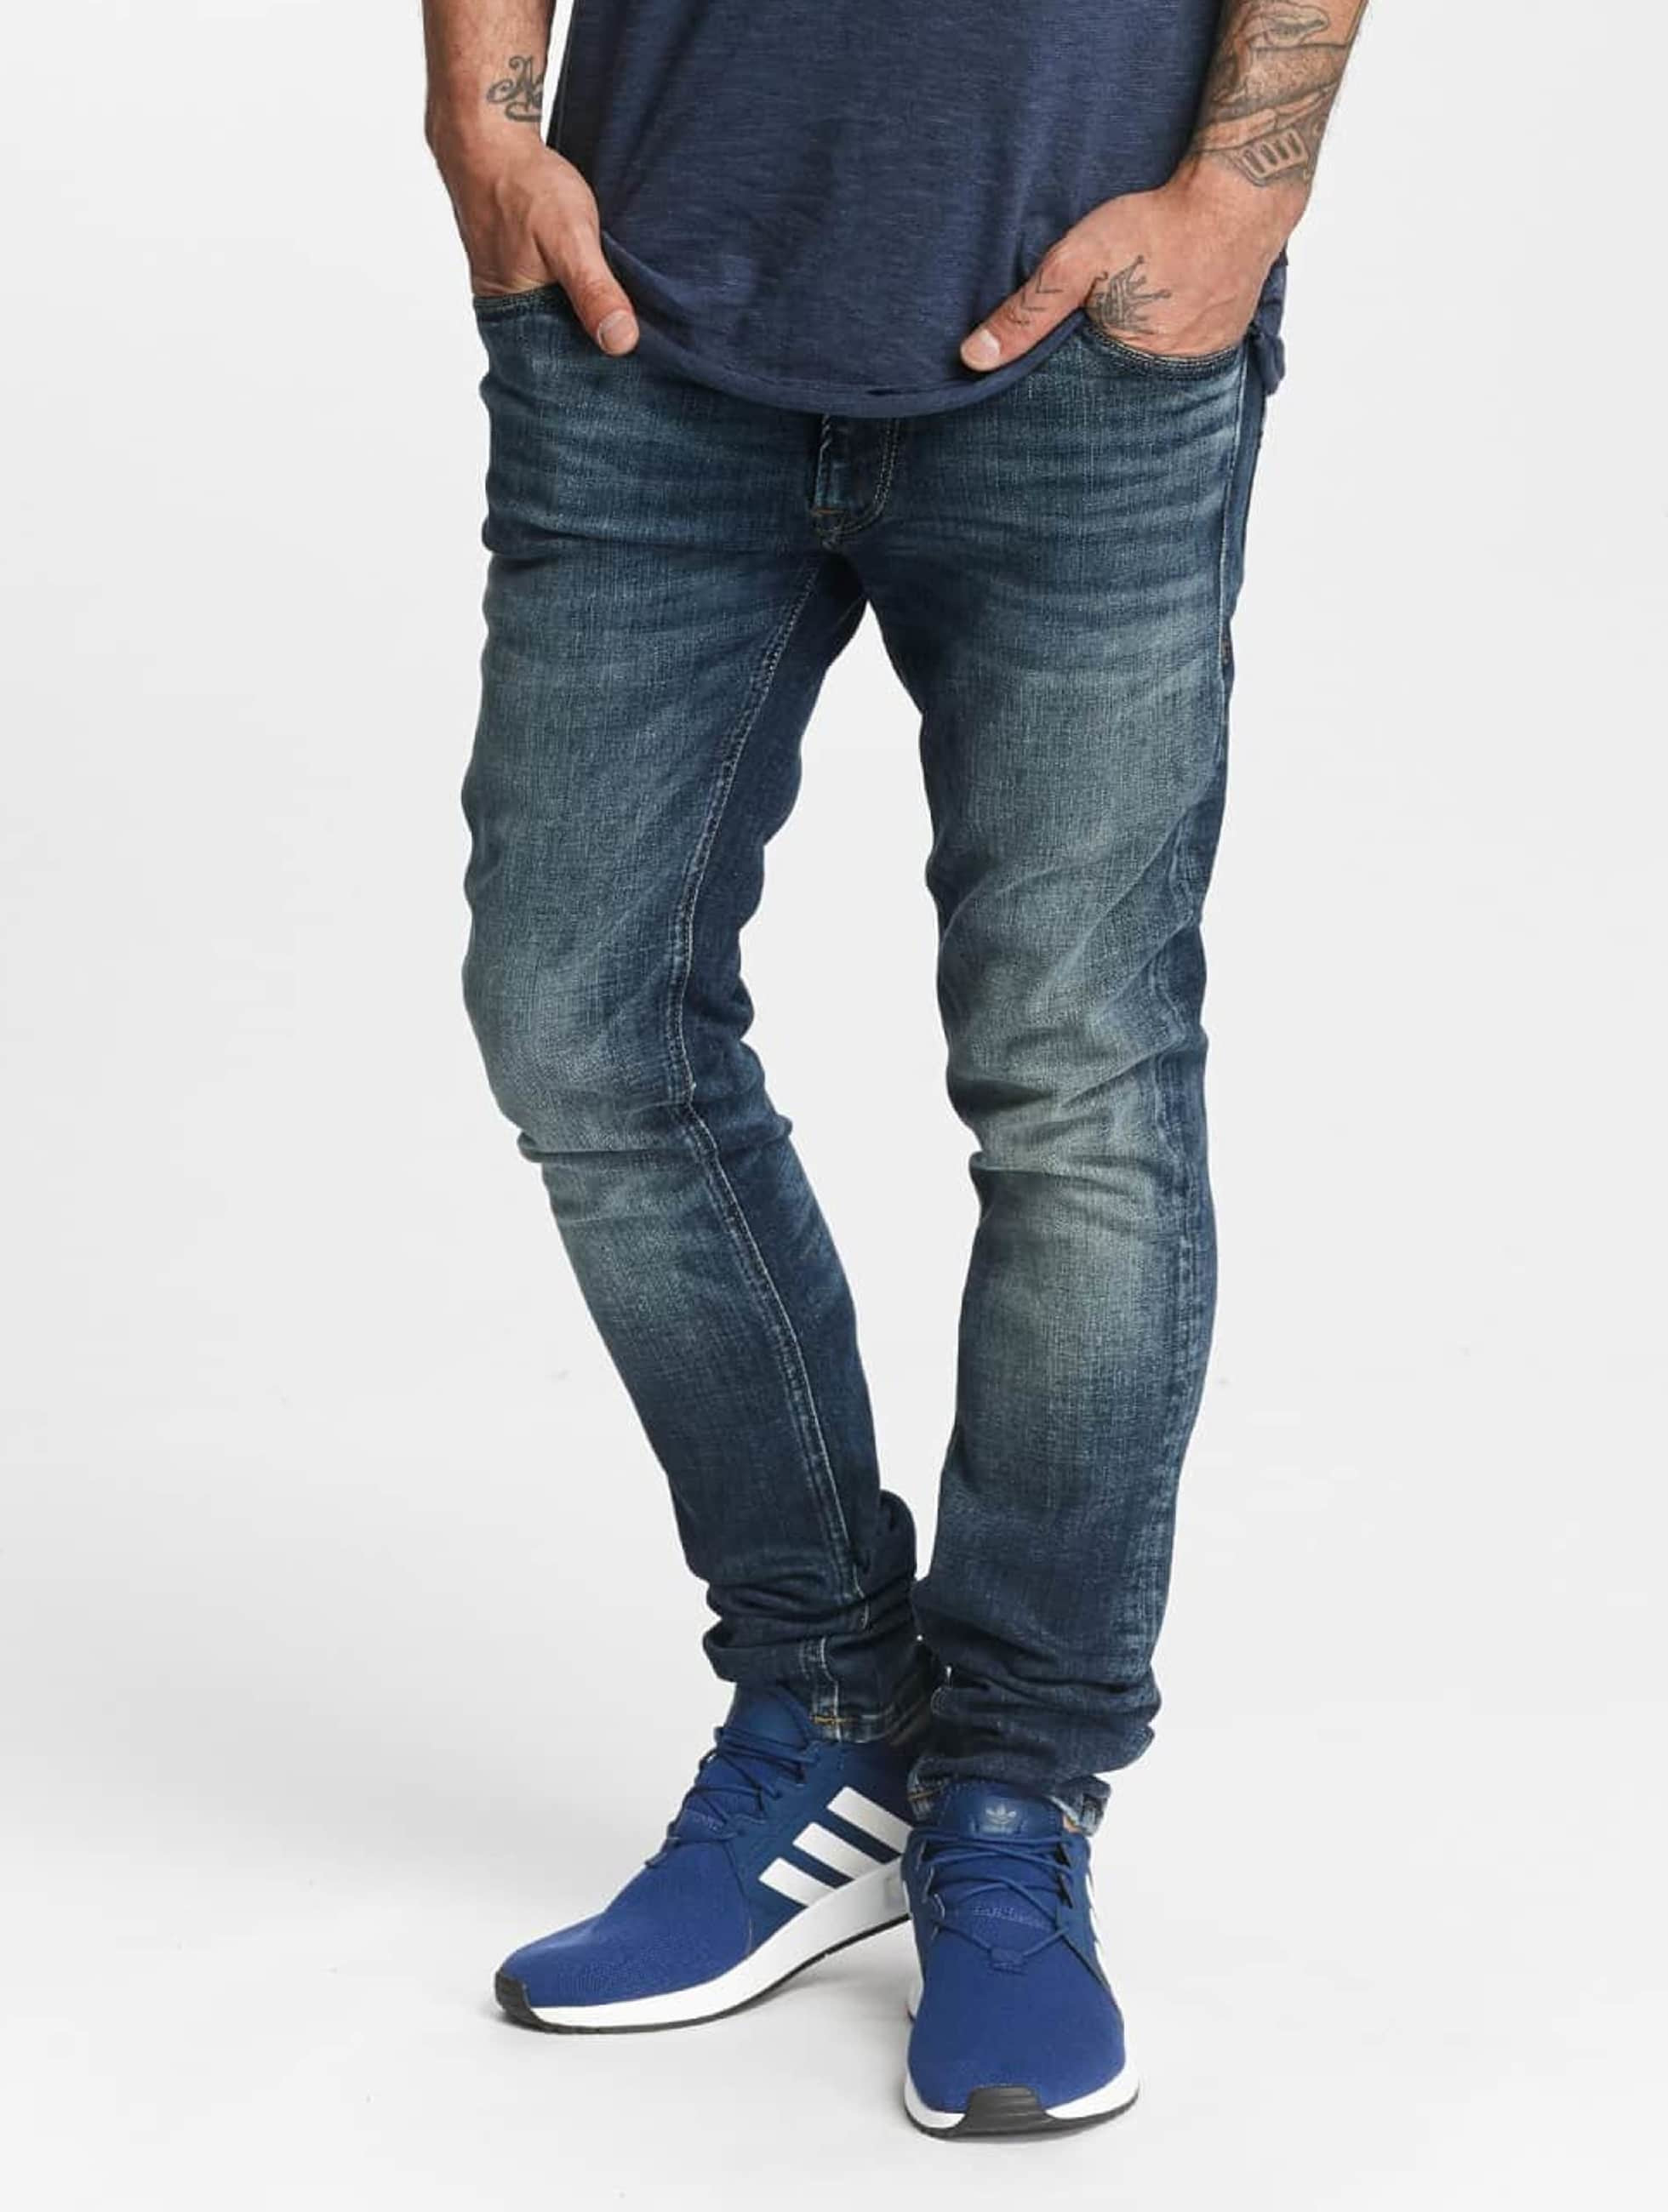 Jack & Jones Männer Skinny Jeans jjLiam Original JJ 019 in blau